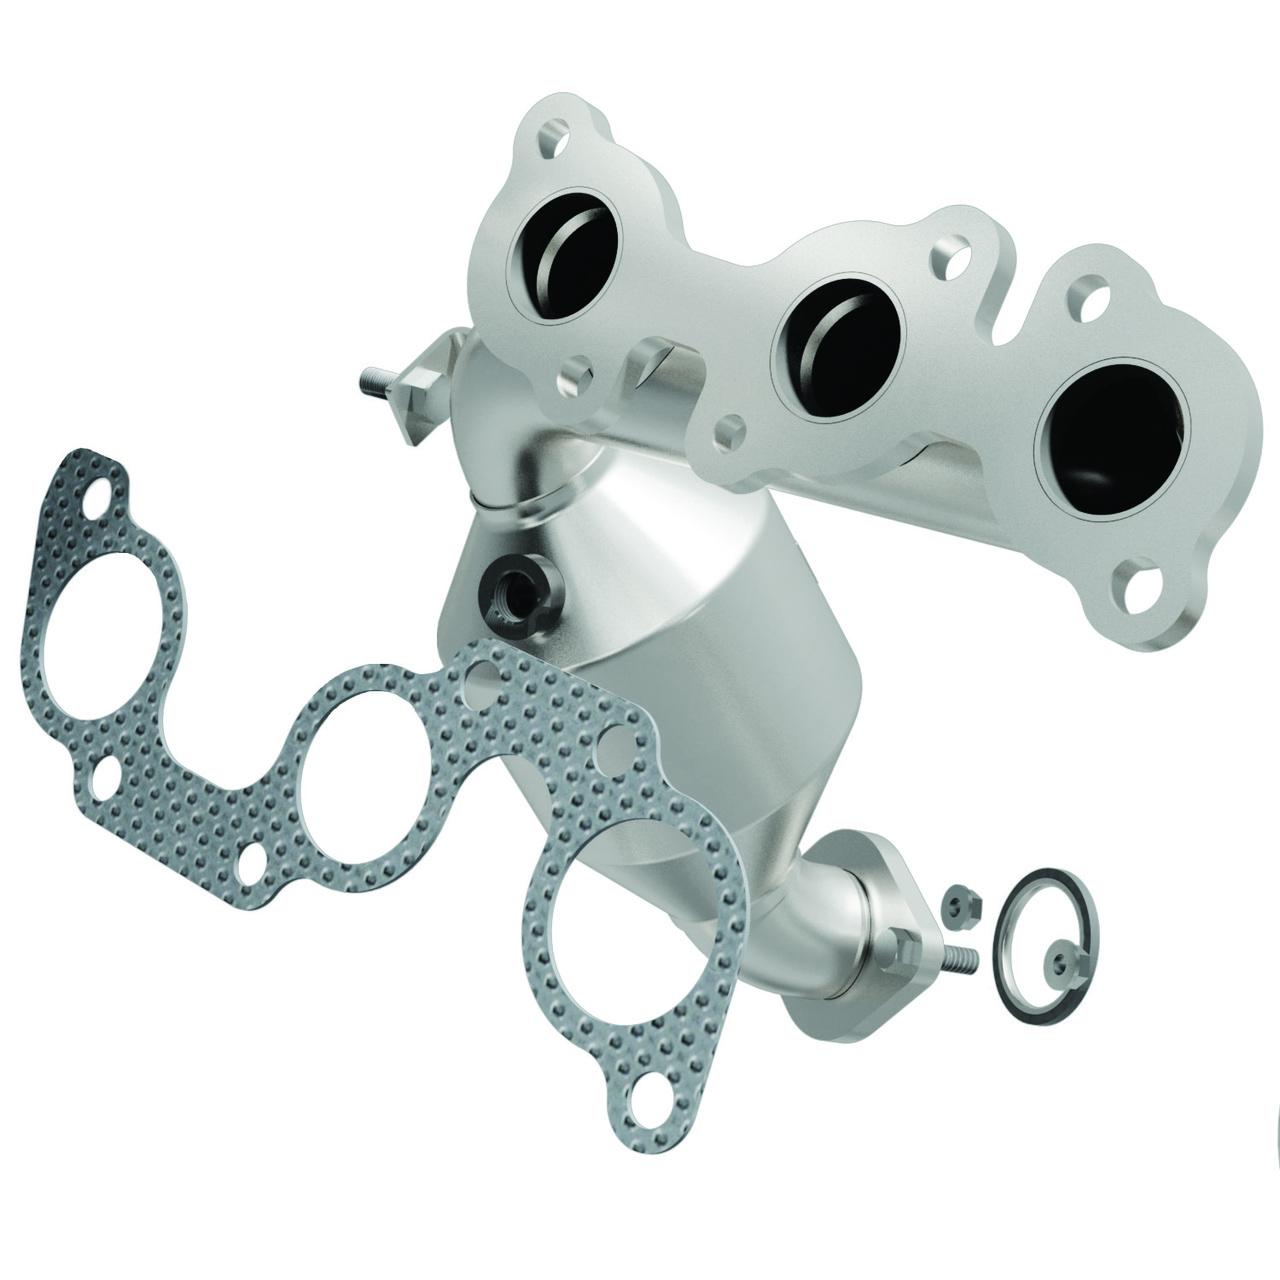 Magnaflow 49837 | LEXUS RX330, TOYOTA SIENNA (AWD)/HIGHLANDER | 3.3L | Passenger Side-BANK 1 | Catalytic Converter-Direct Fit | OEM Grade EPA